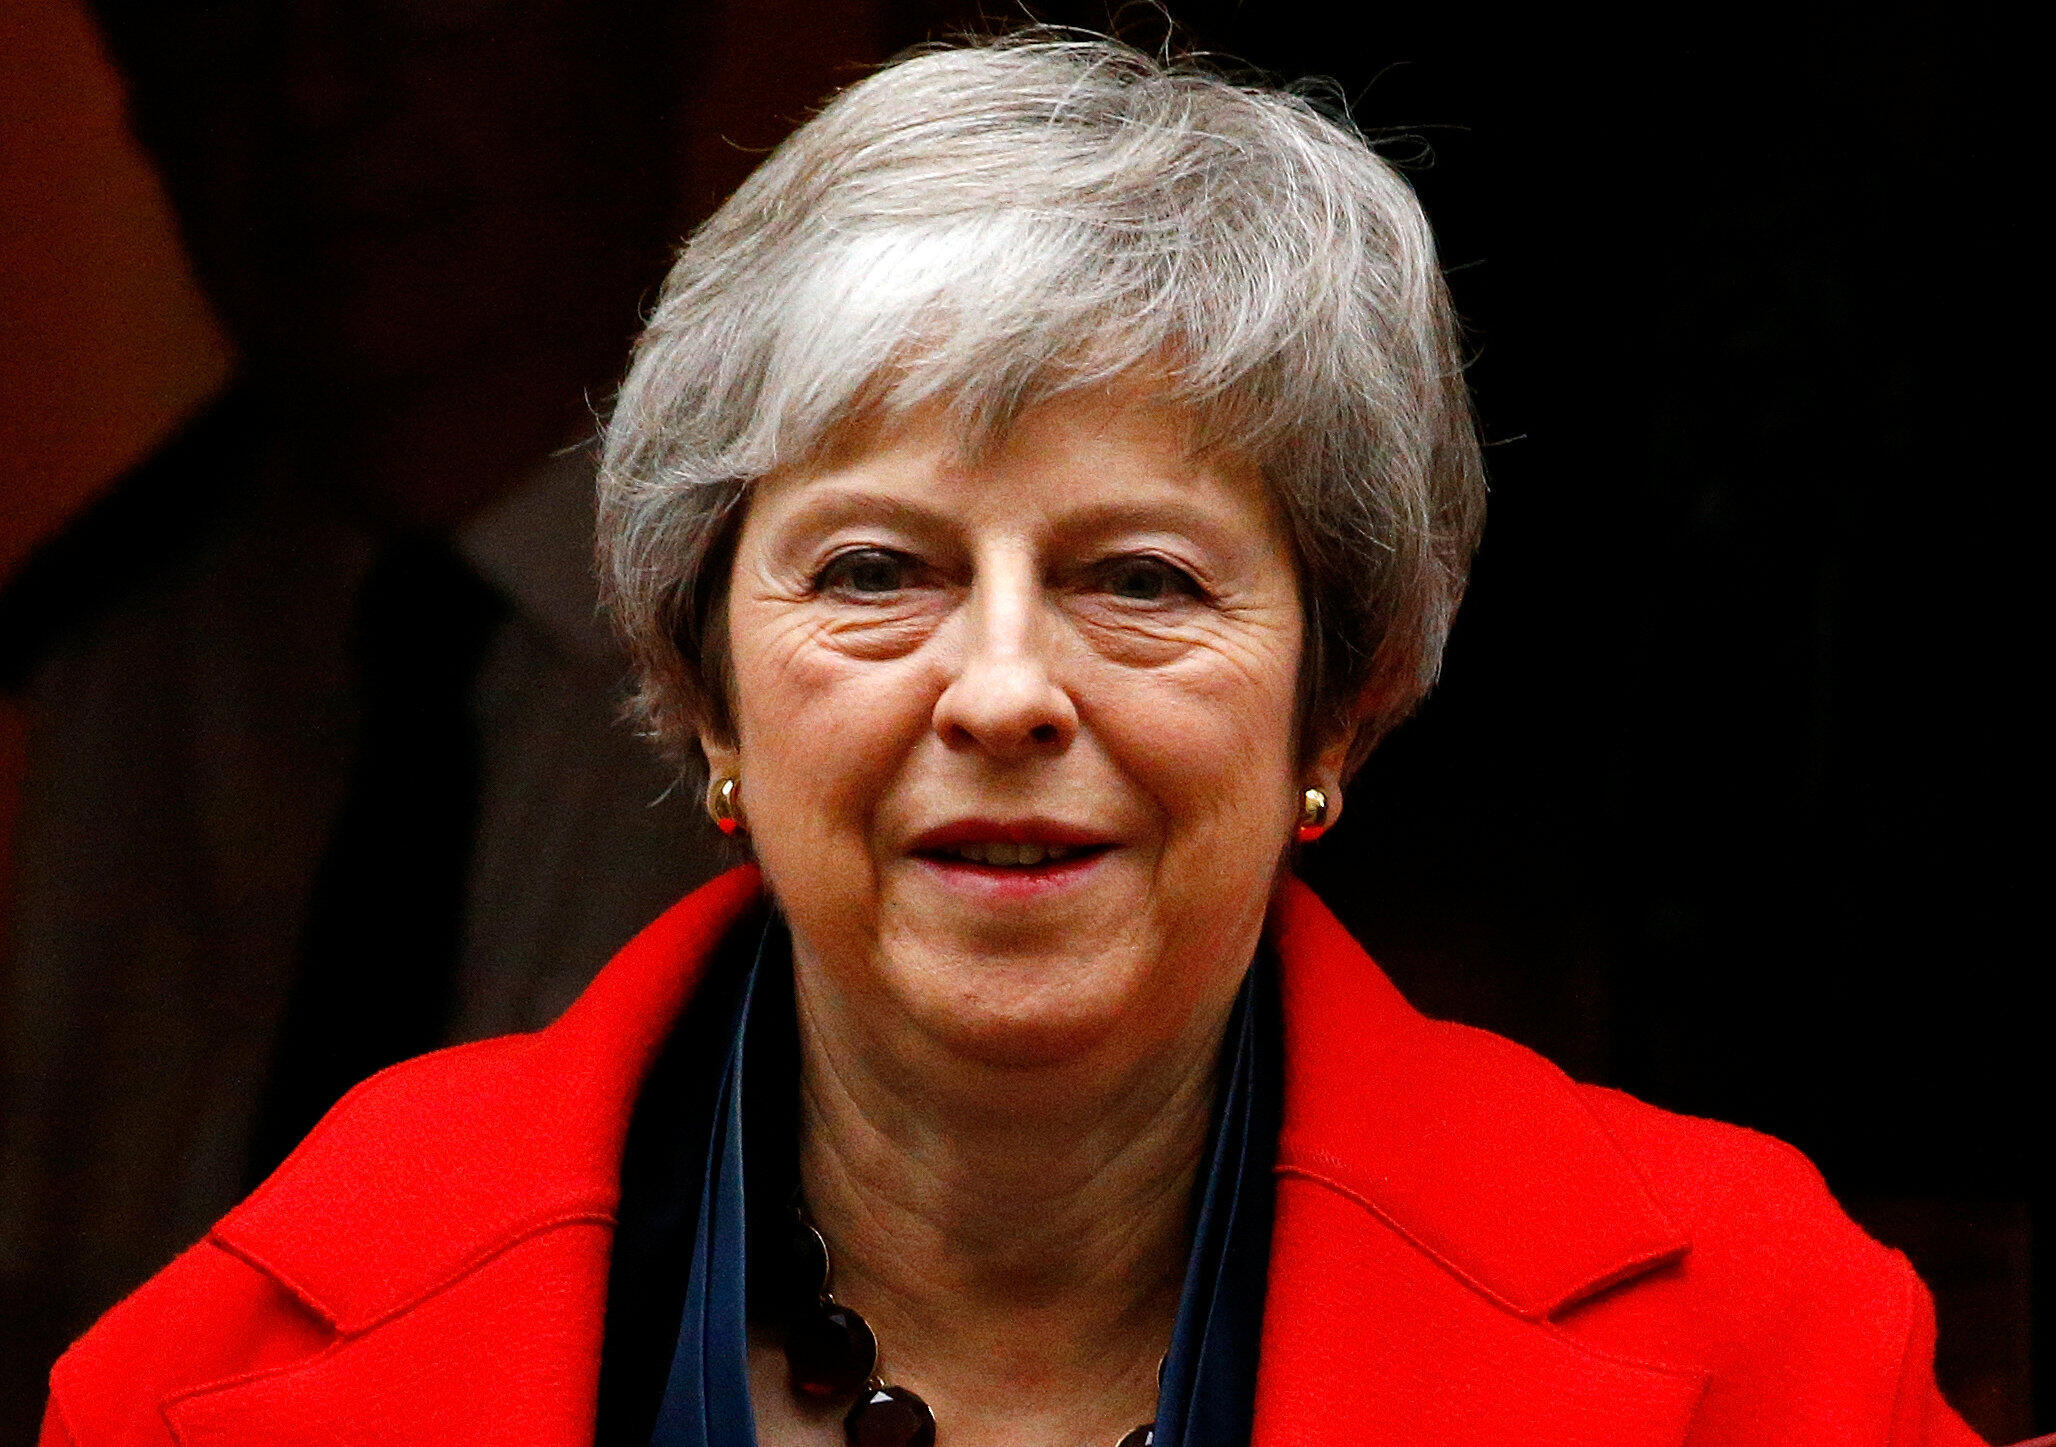 A primeira-ministra britânica Theresa May anunciou o adiamanto do voto sobre o acordo final do Brexit